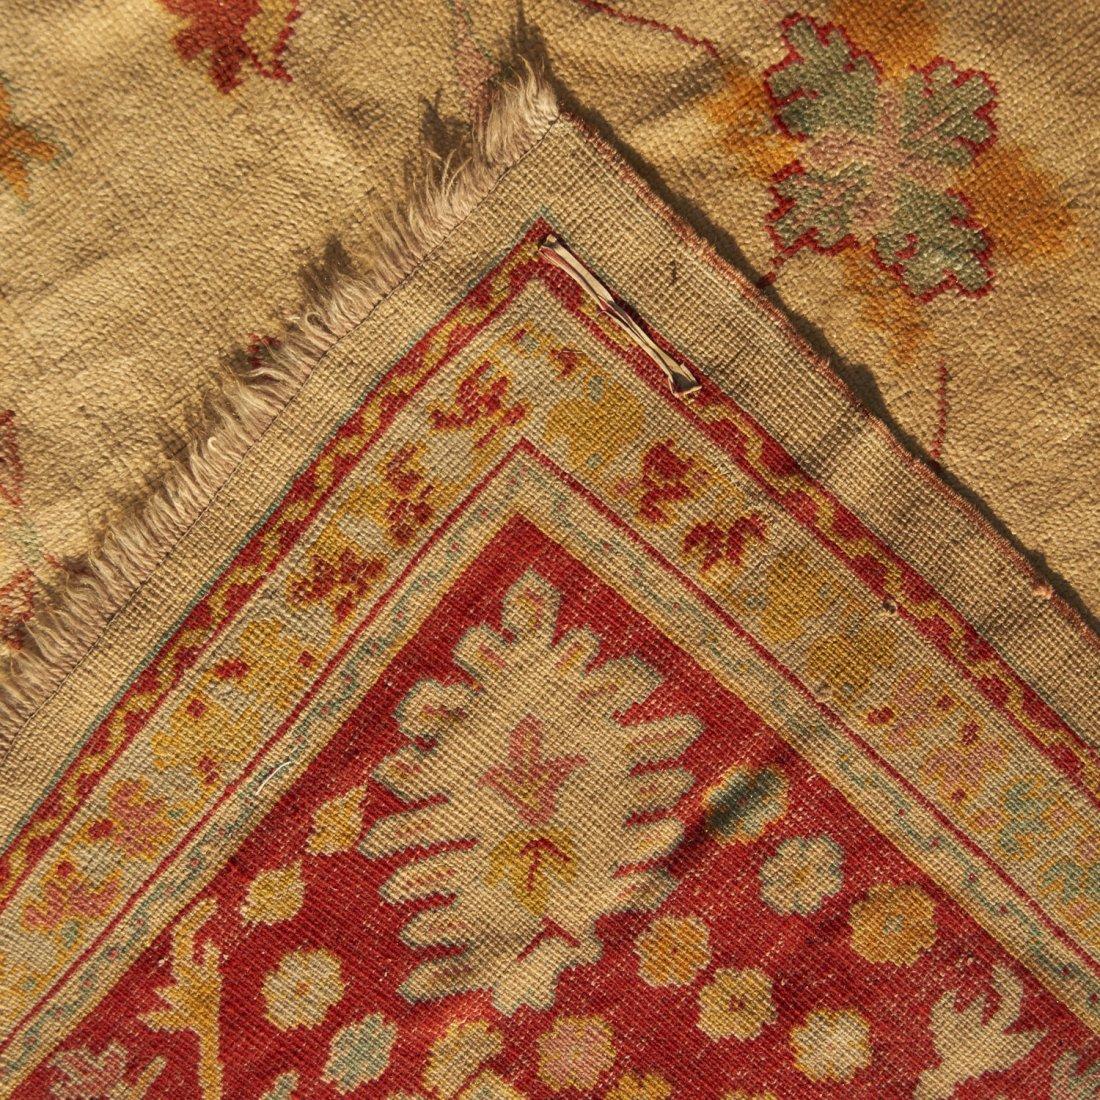 Room-size Oushak carpet - 7